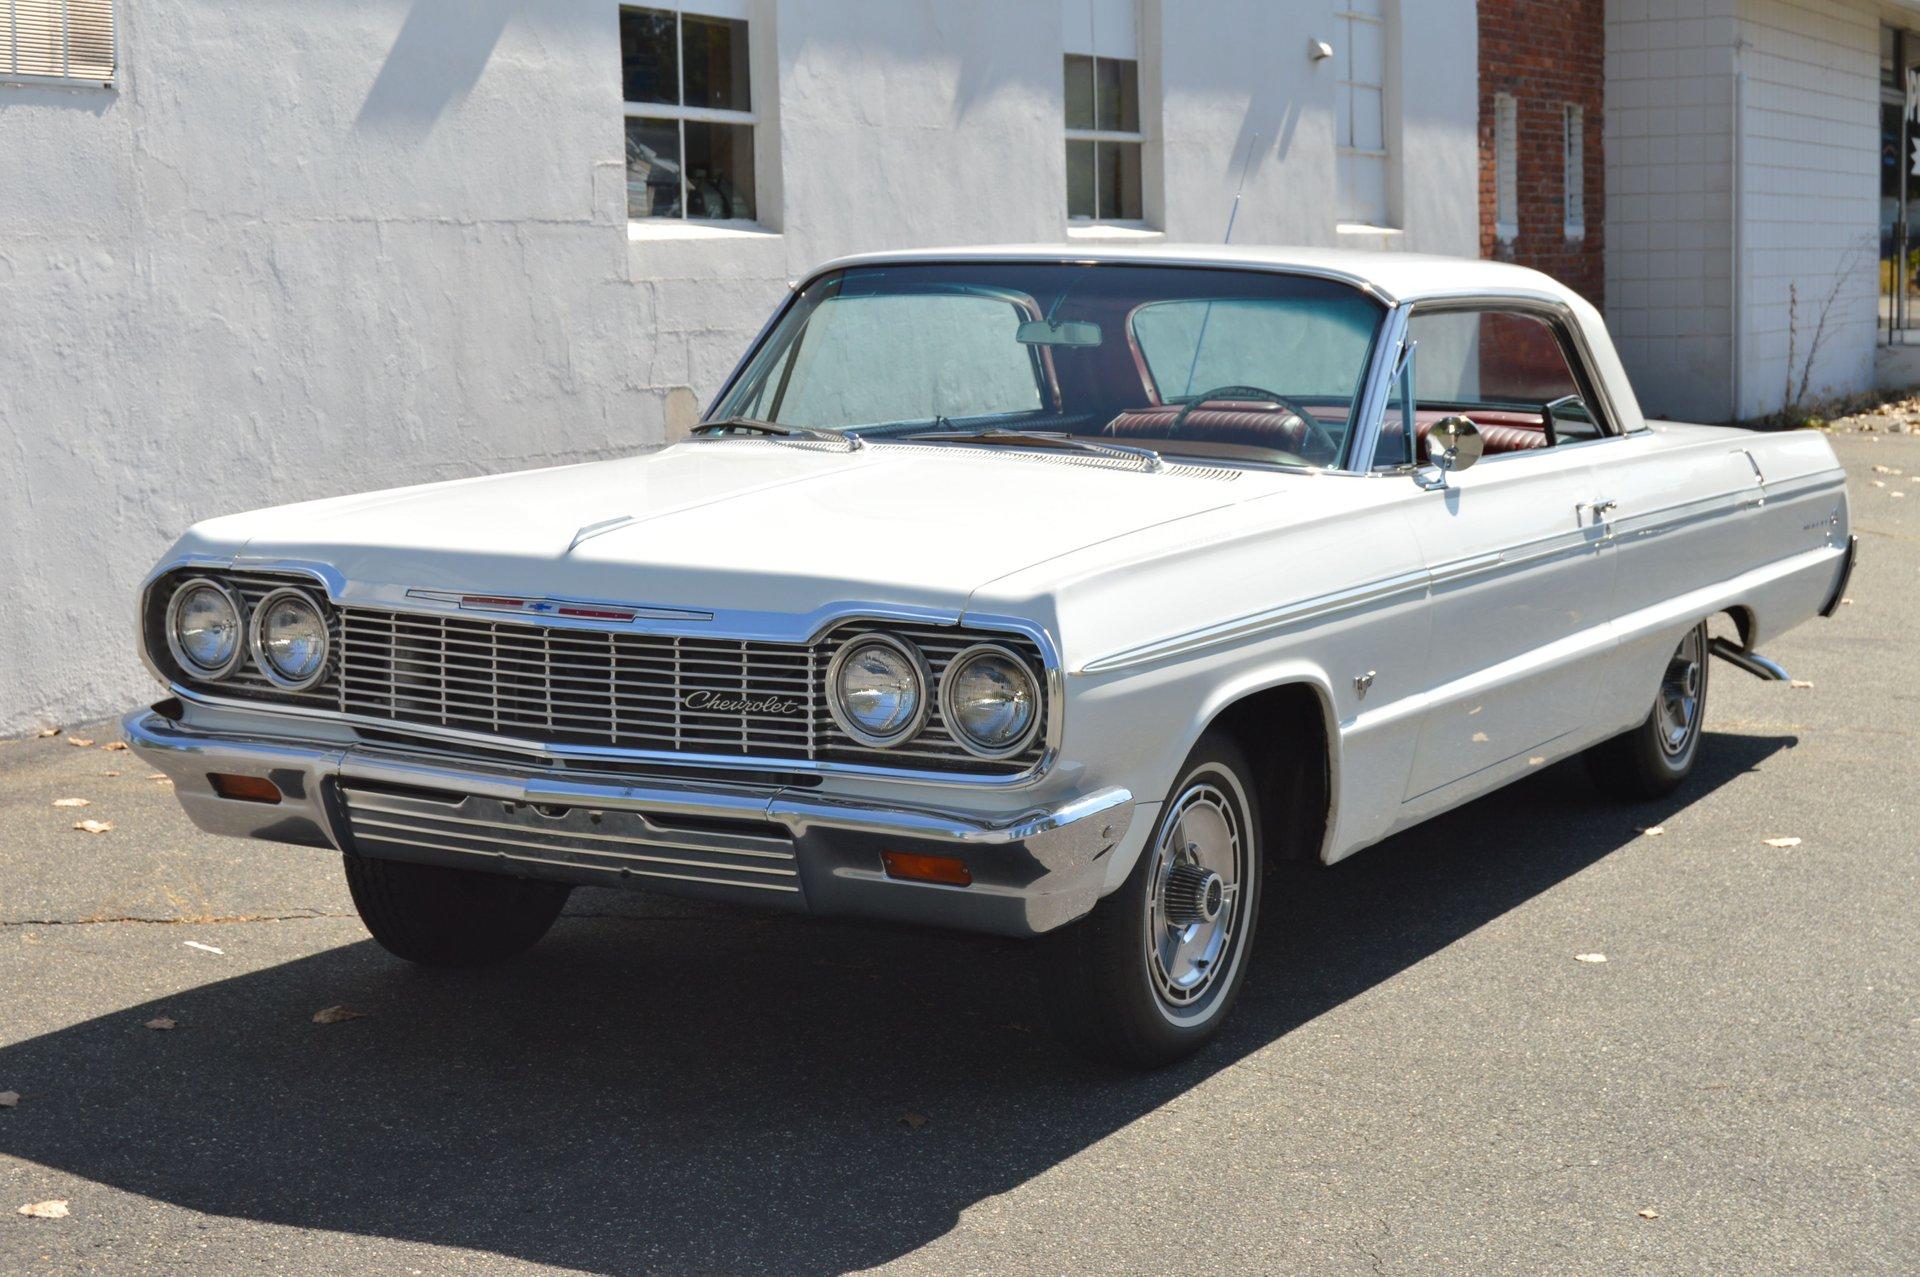 1964 chevrolet impala ss super sport